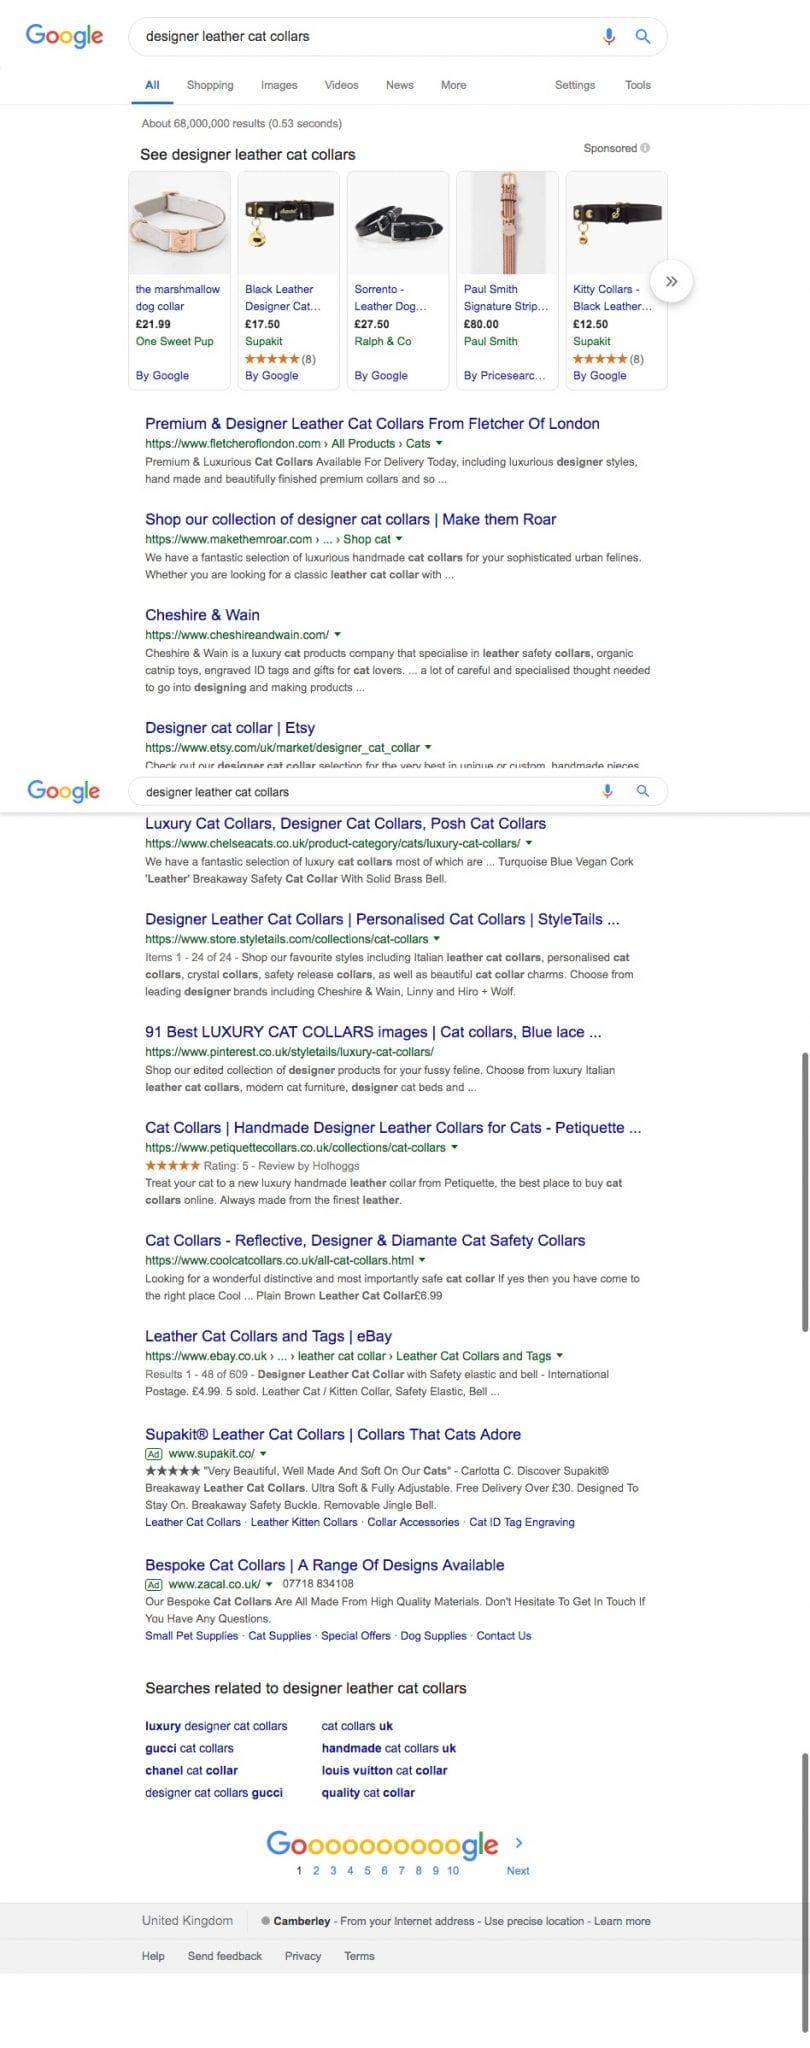 Search Engine Market Share United Kingdom | StatCounter ...